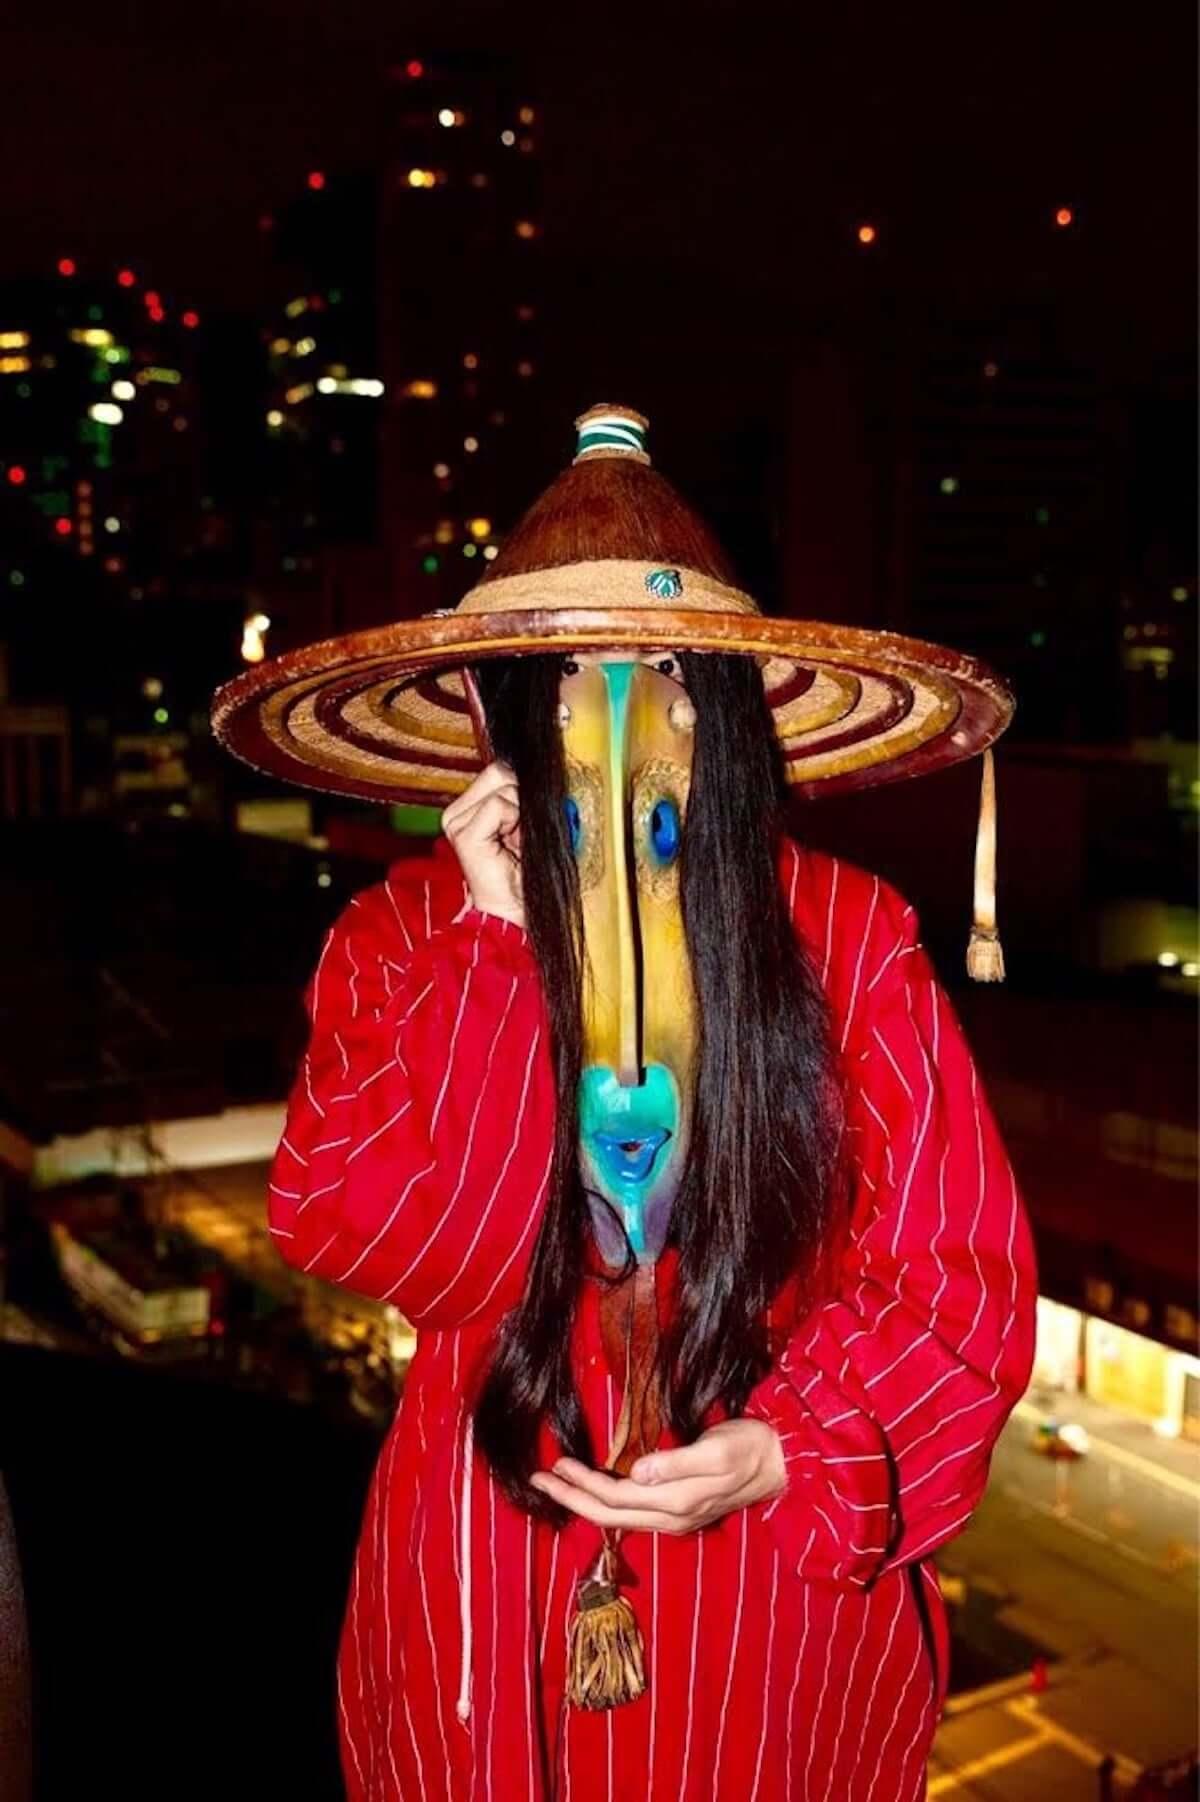 GEZANのマヒトゥ・ザ・ピーポーが新作『不完全なけもの』を2月にリリース|寺尾紗穂や山田碧、岡村基紀らが参加 mahitothepeople-1200x1802